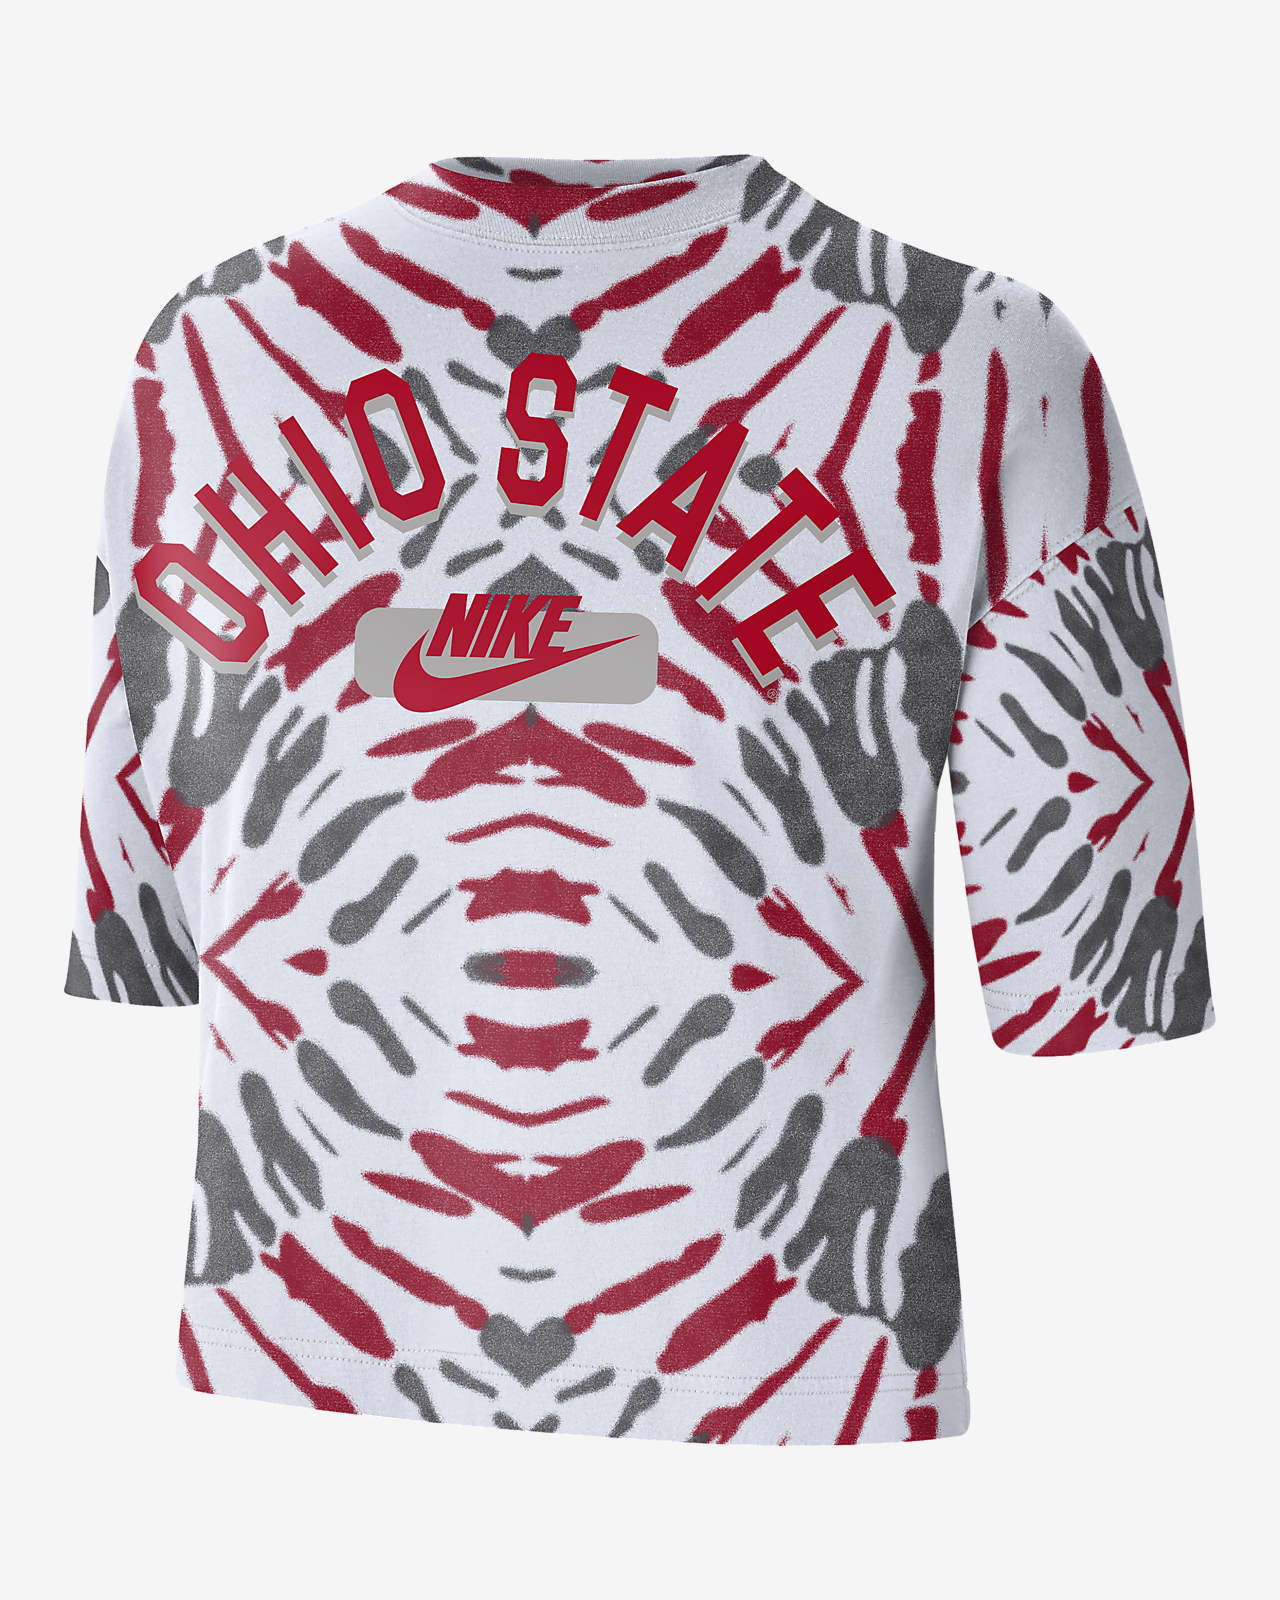 Nike College (Ohio State) Women's Boxy Printed T-Shirt